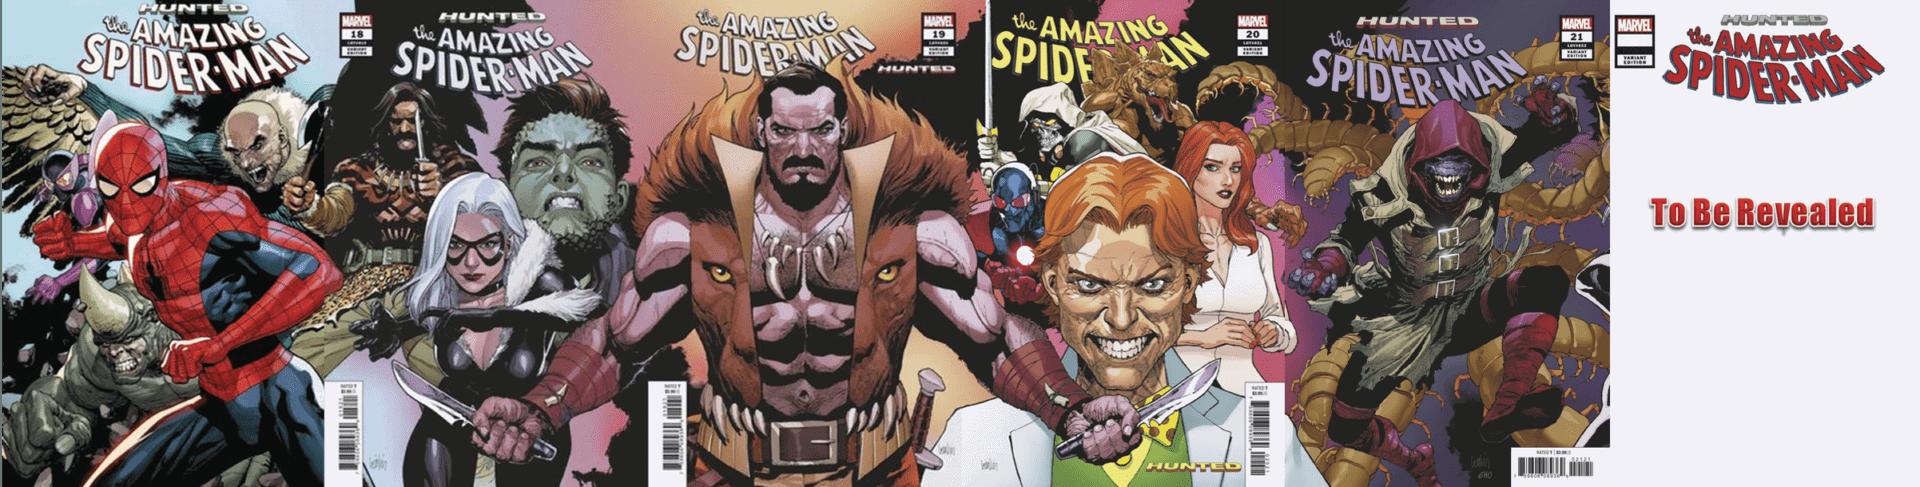 Amazing Spider-Man #21 Marvel 2019 Yu Connecting Variant